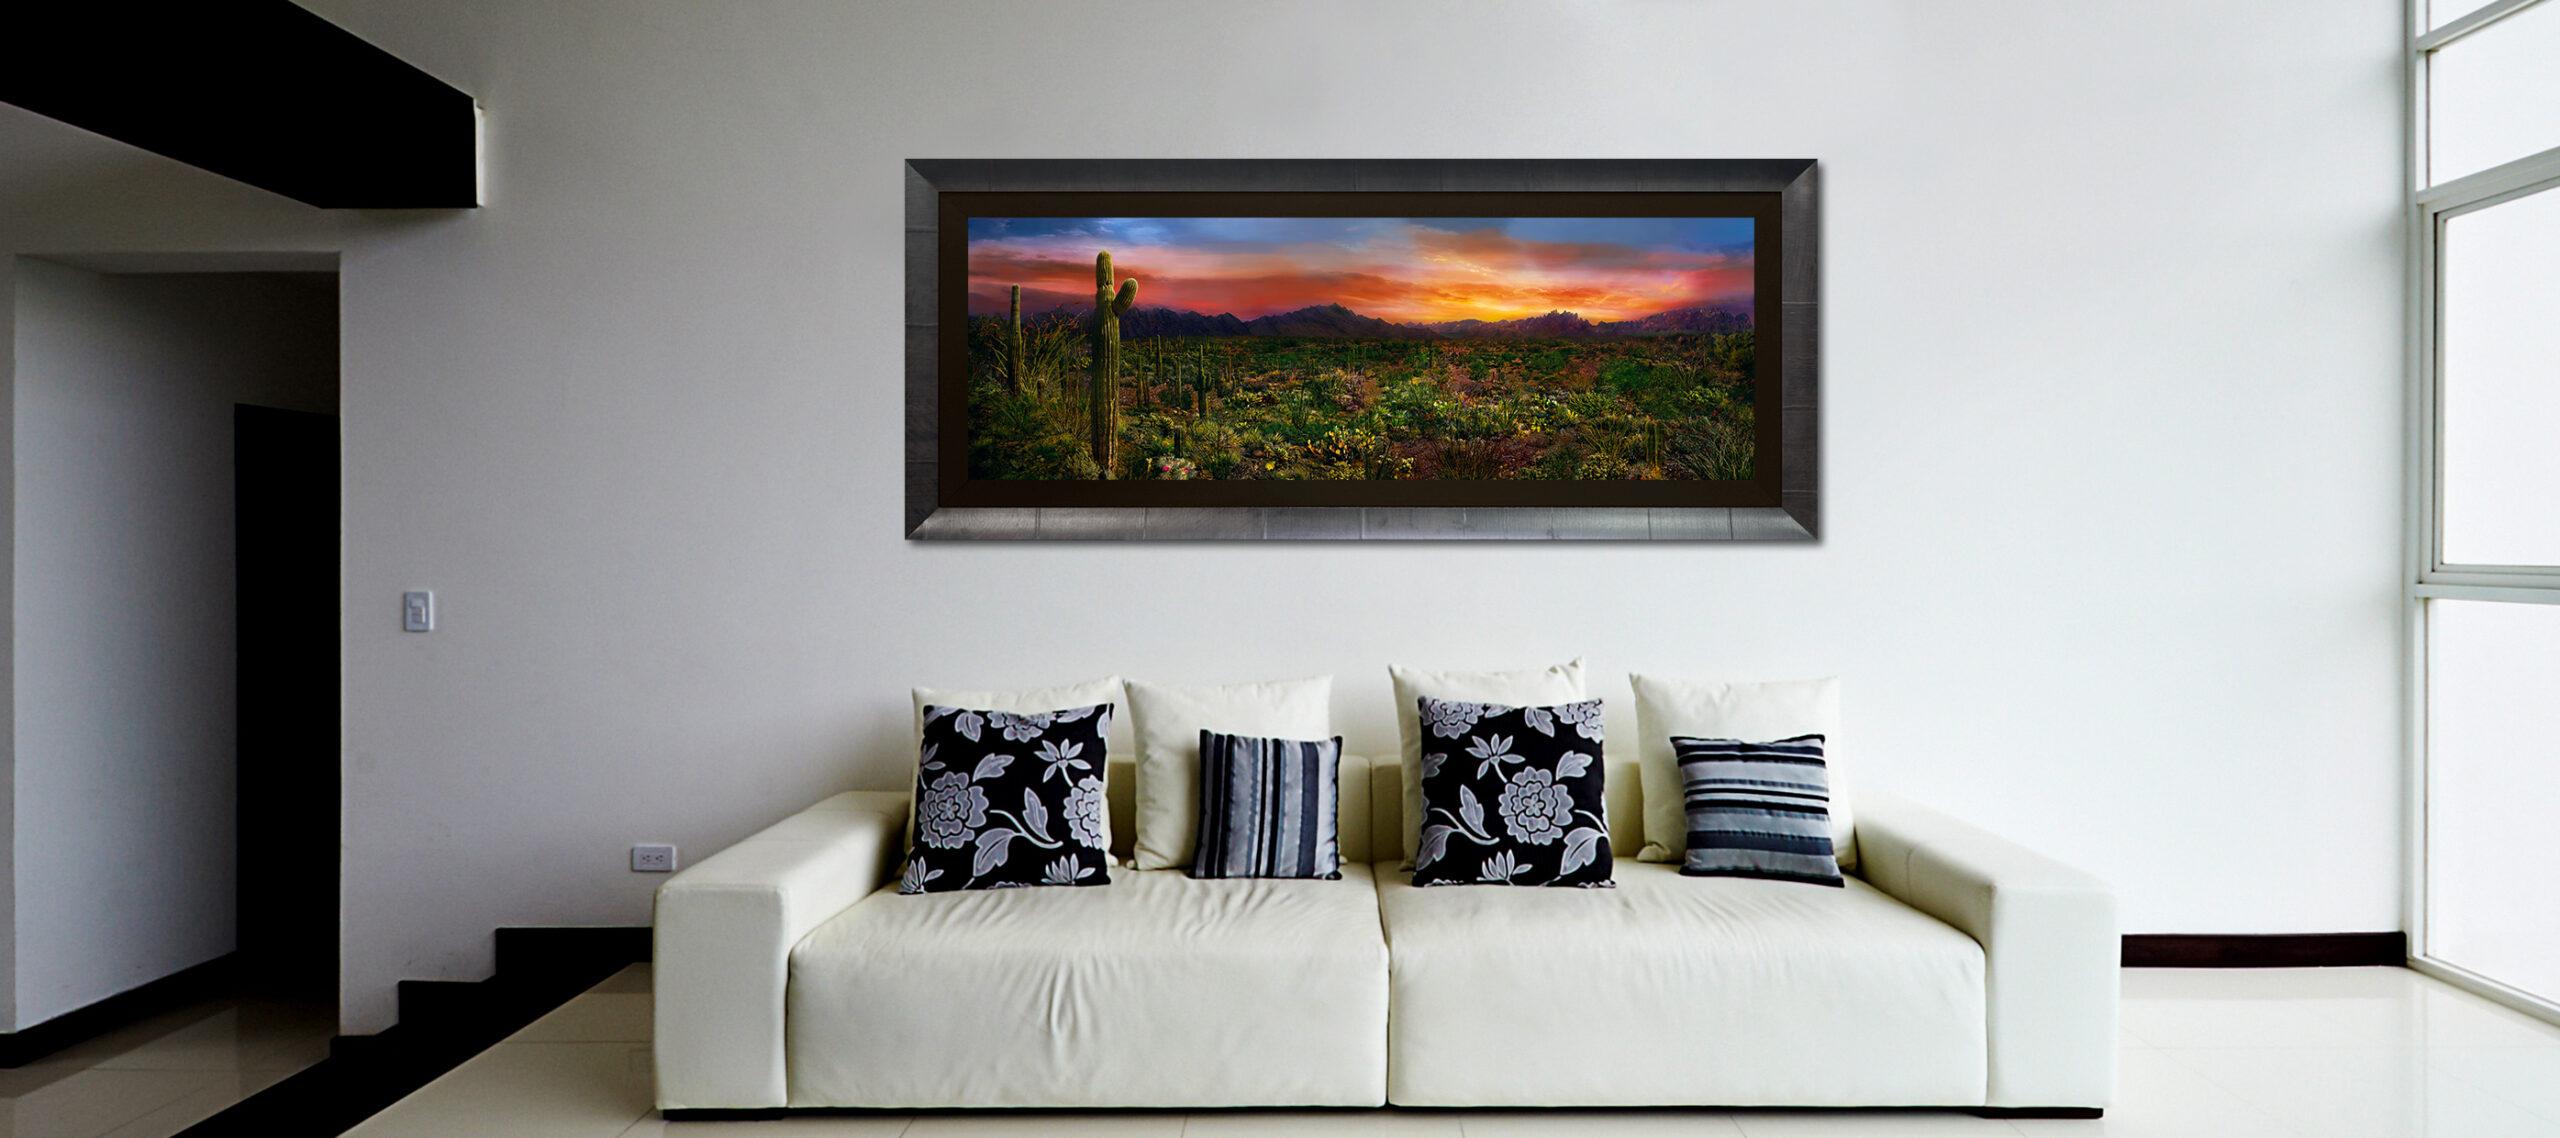 Interior,Design,Series:,Modern,Living,Room